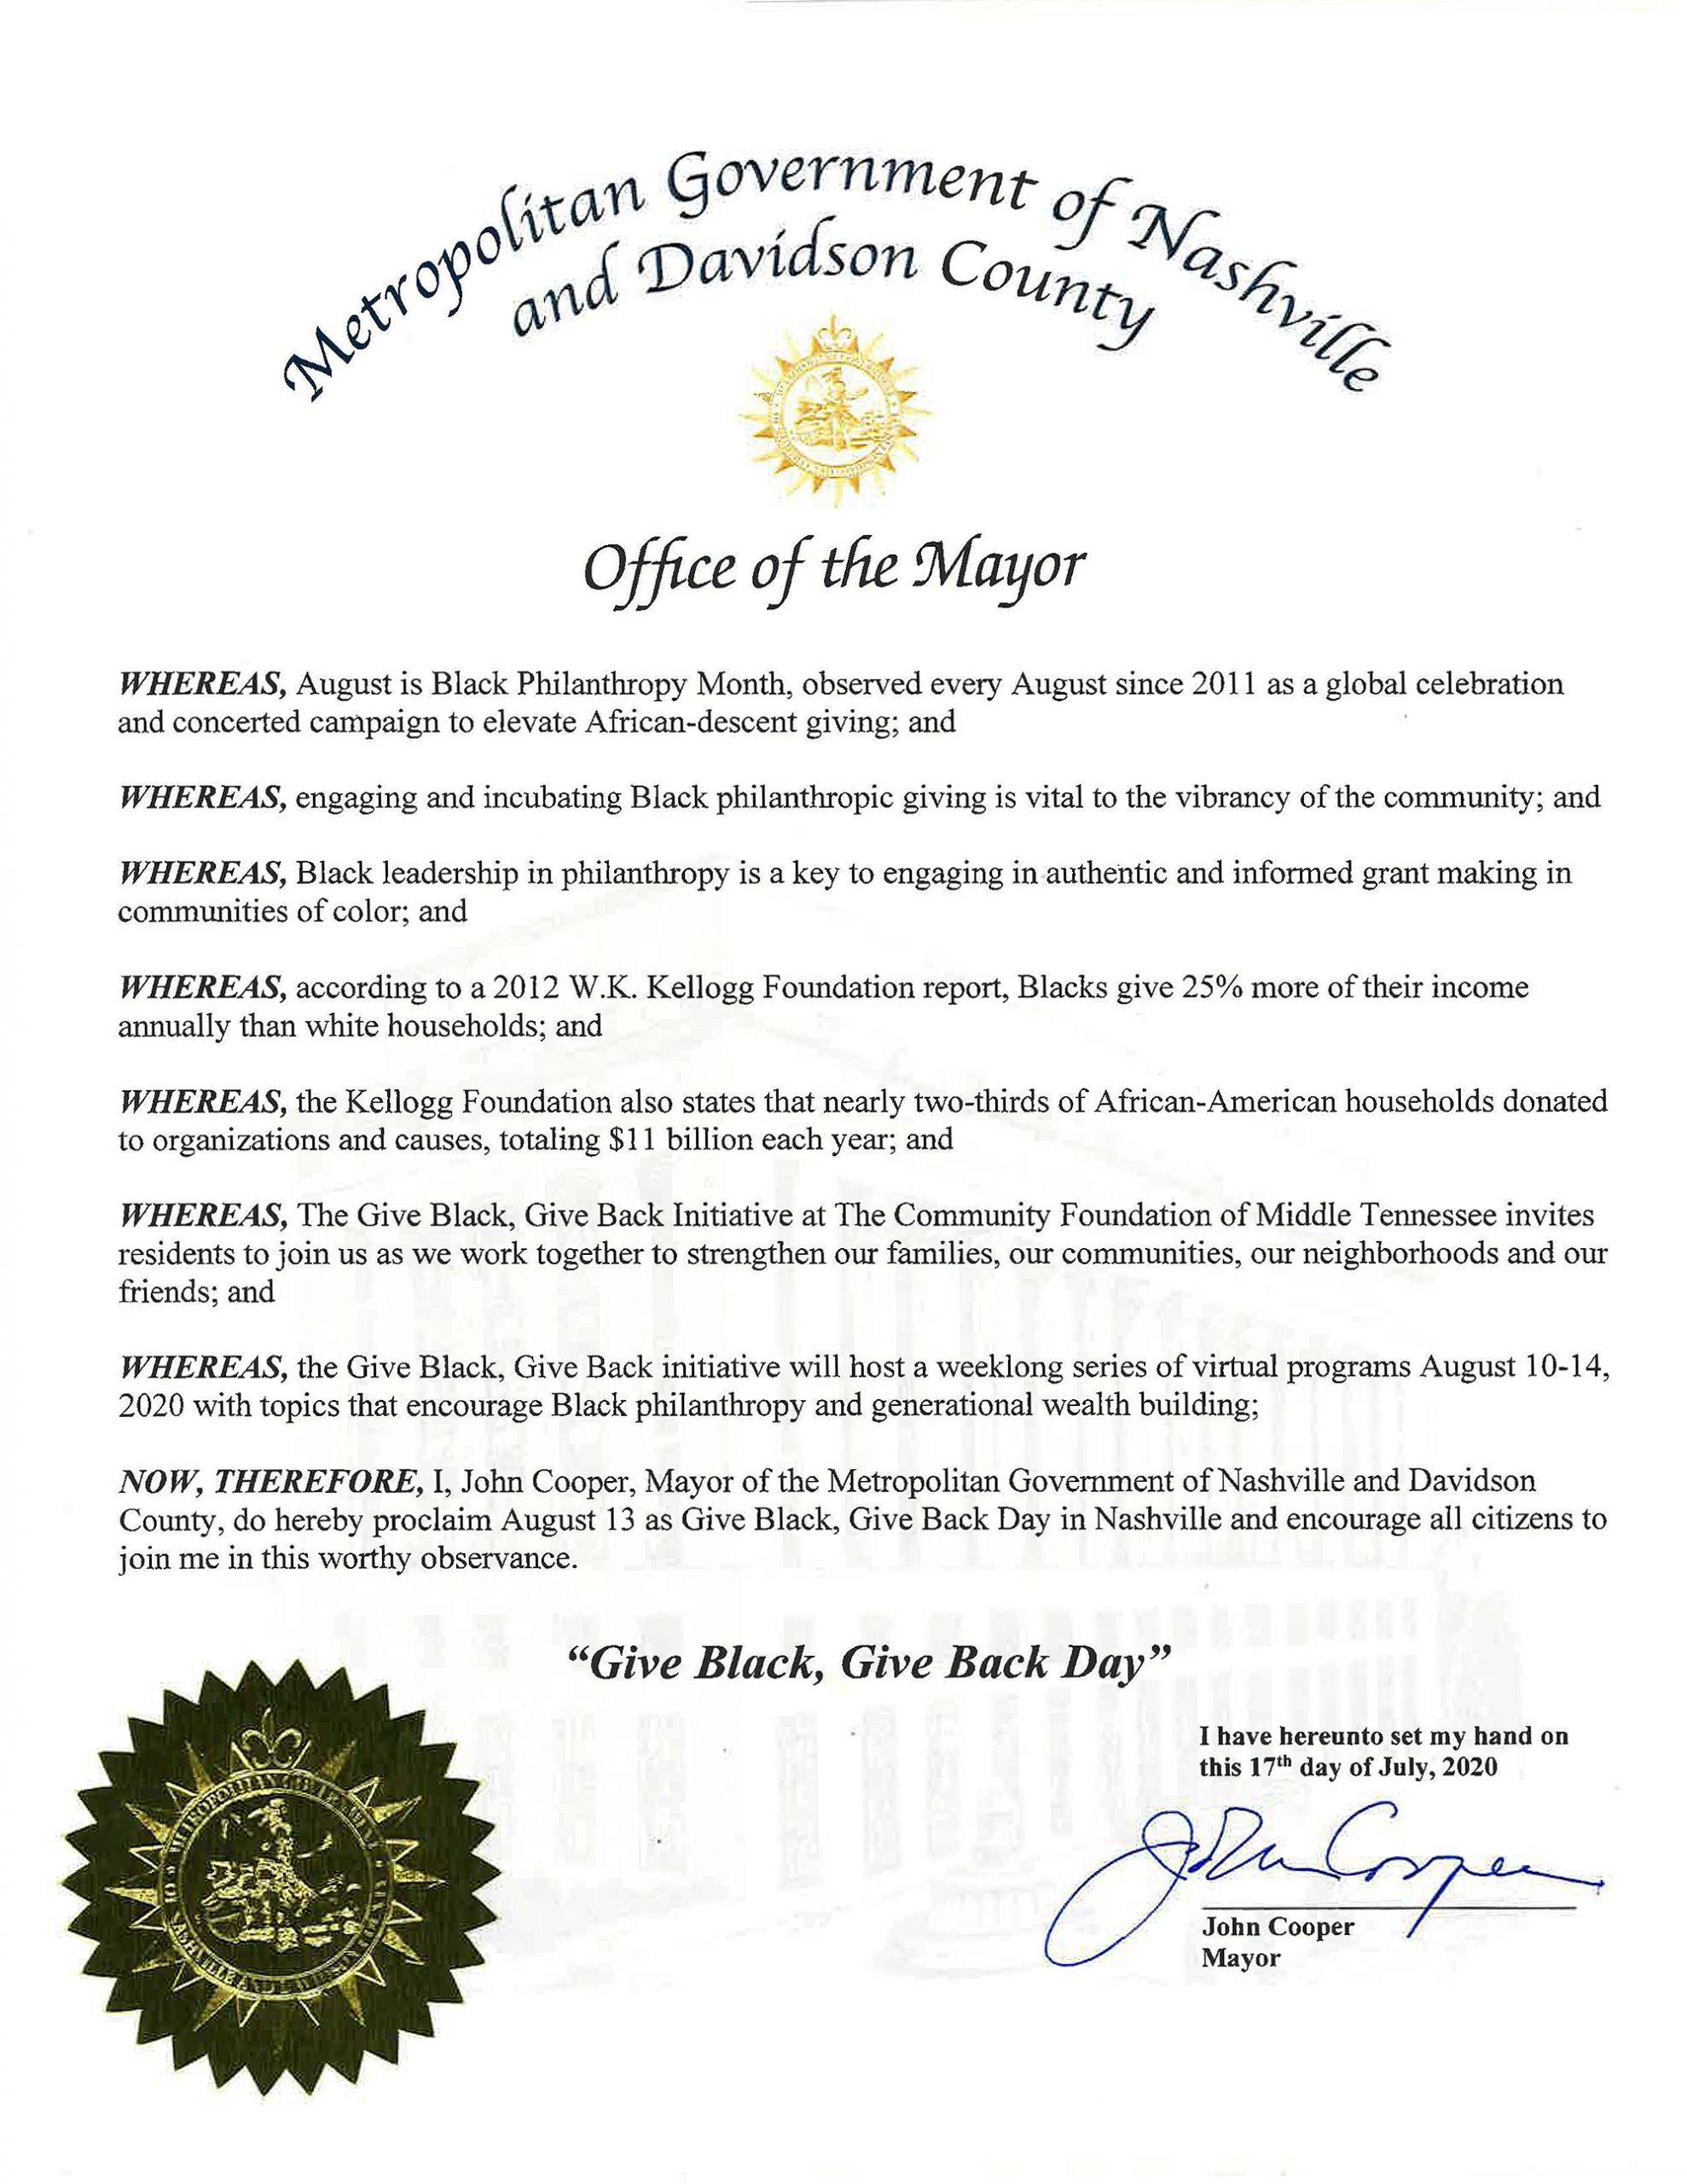 Give Black, Give Back Mayors Proclamation